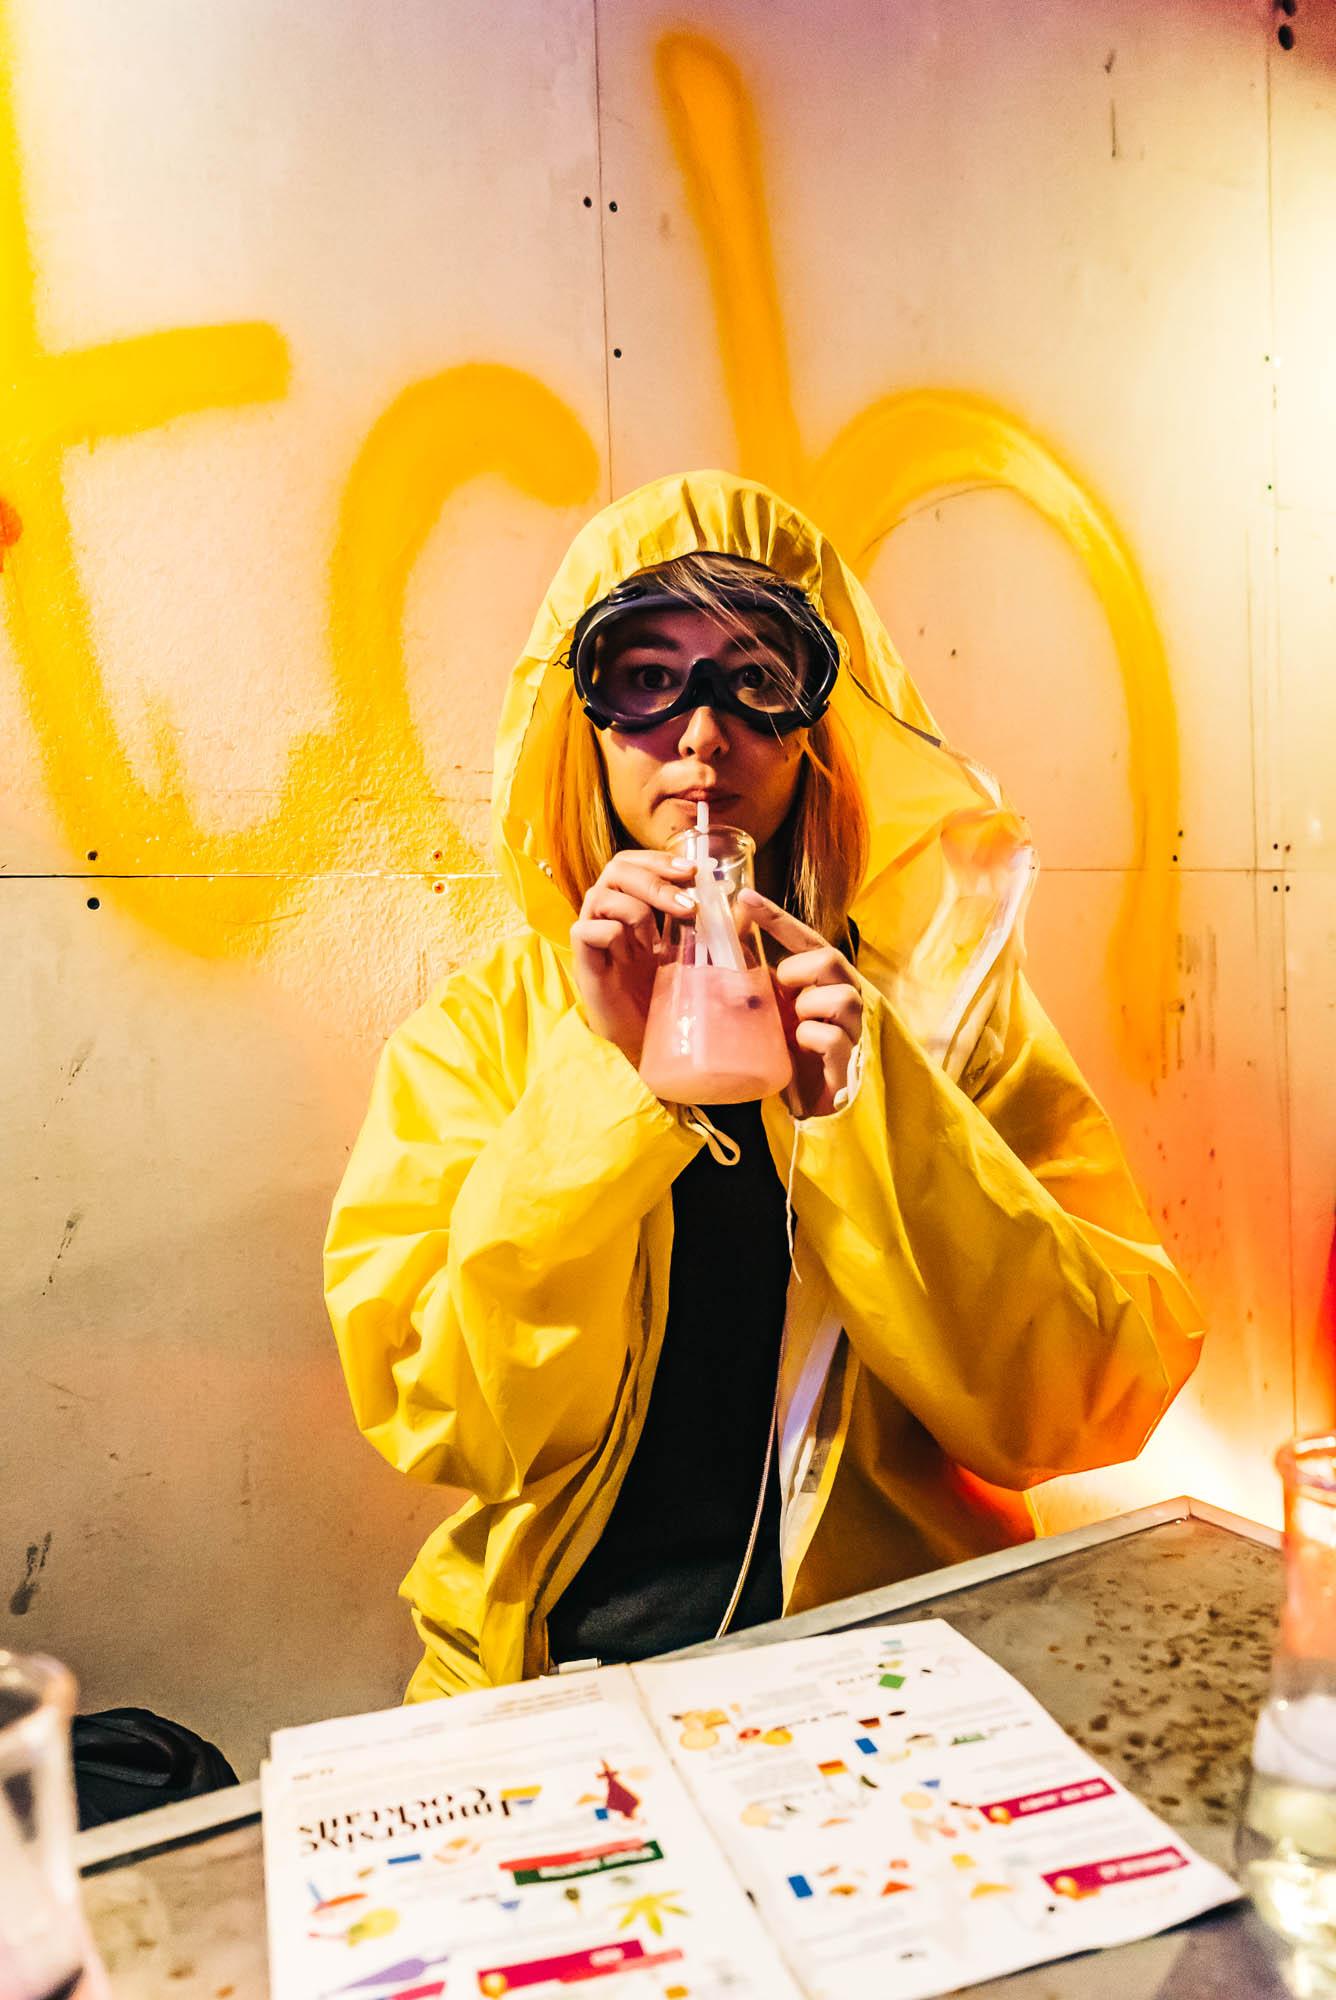 ABQ London Breaking Bad Themed Bar  #ABQ #London #BreakingBad